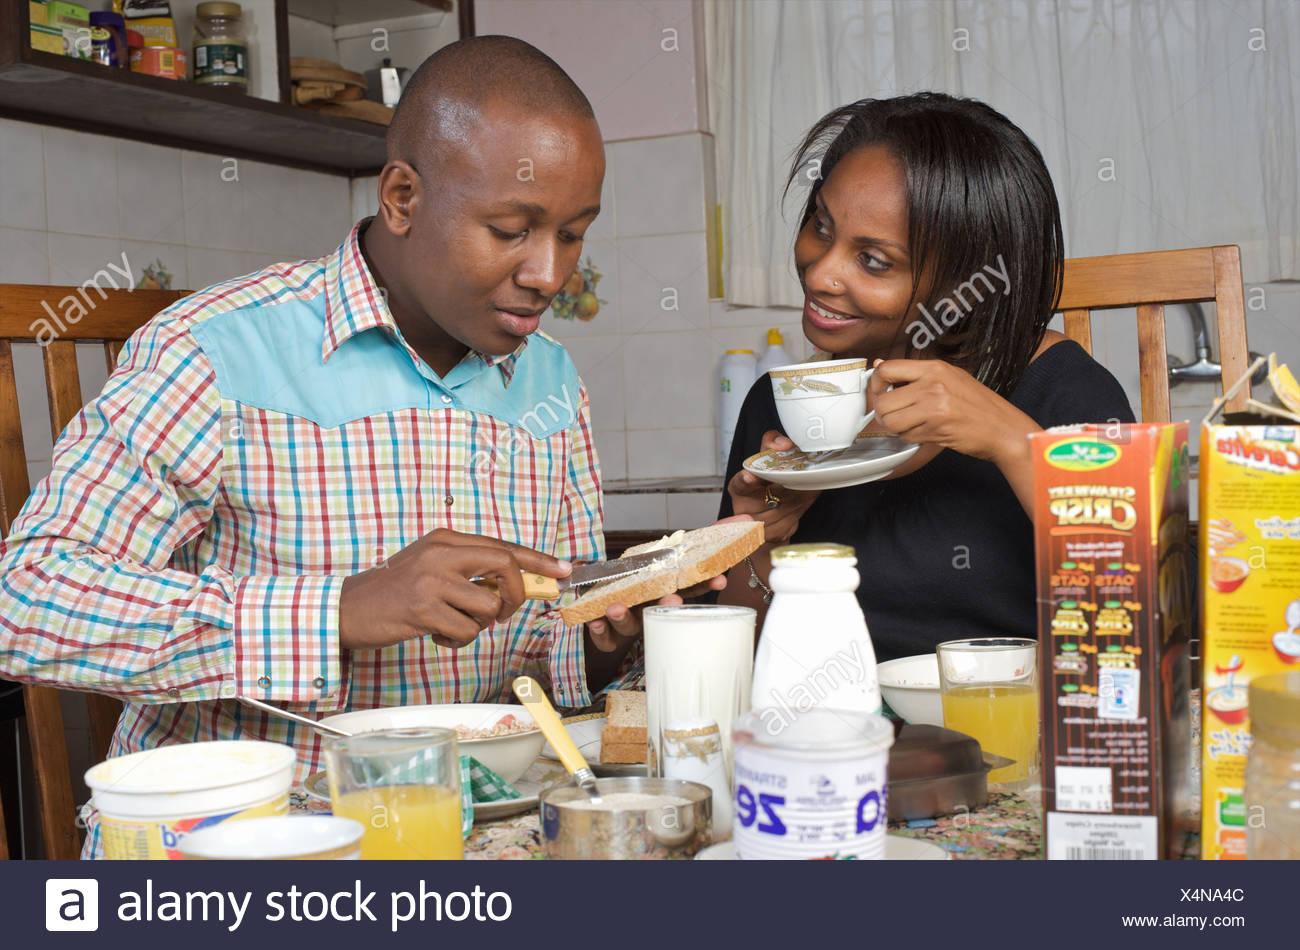 Kenyan couple sharing breakfast, Nairobi, Kenya Stock Photo